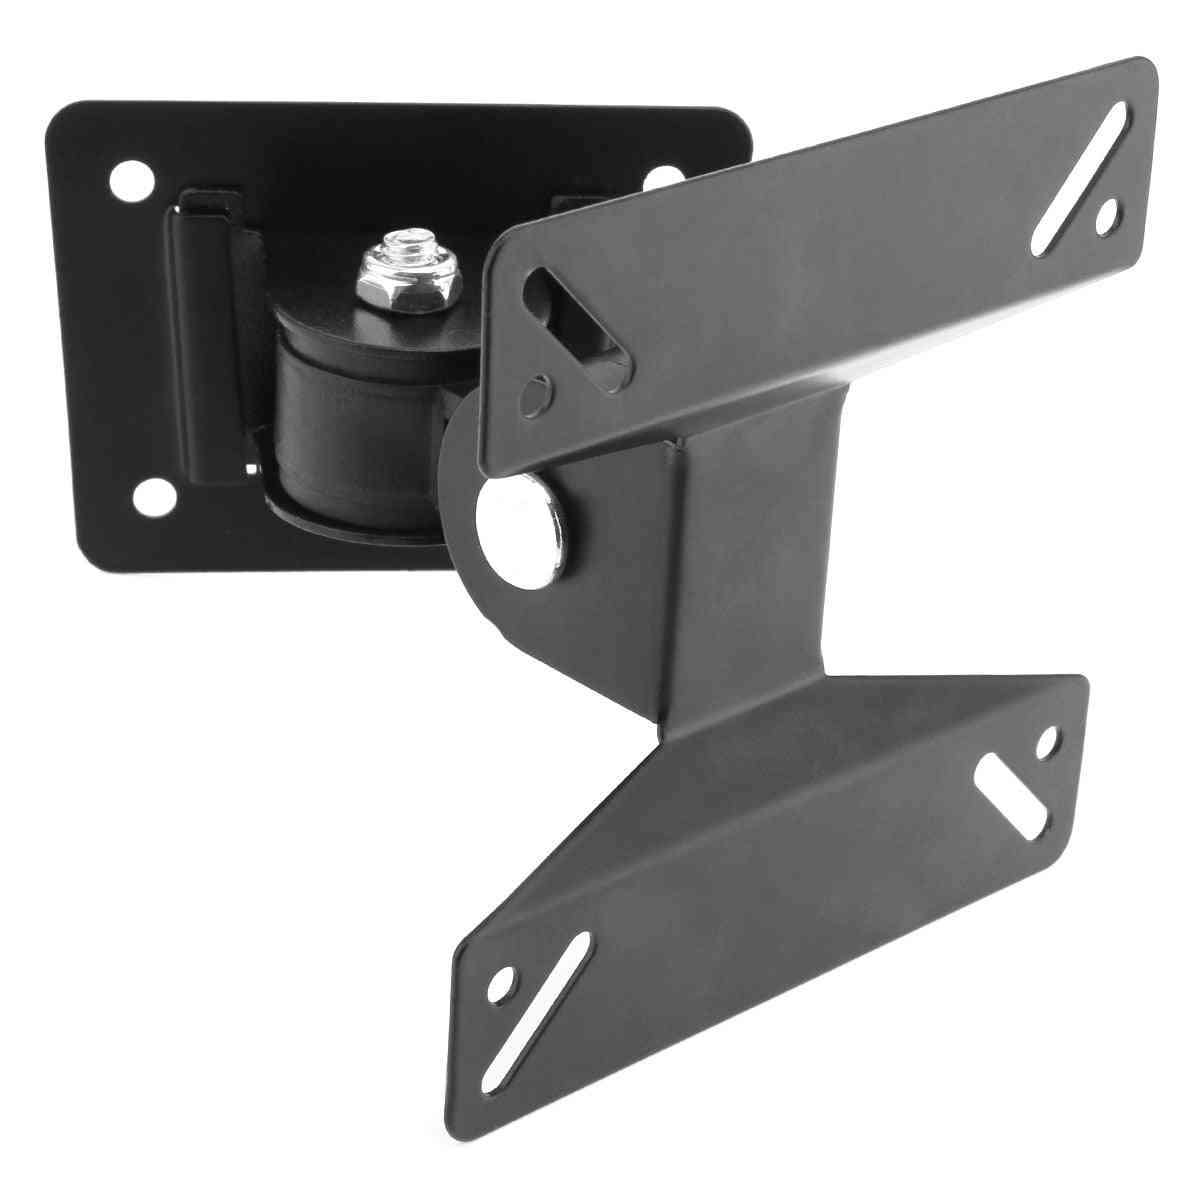 Adjustable And Rotatable-wall Mount Tv Holder Bracket